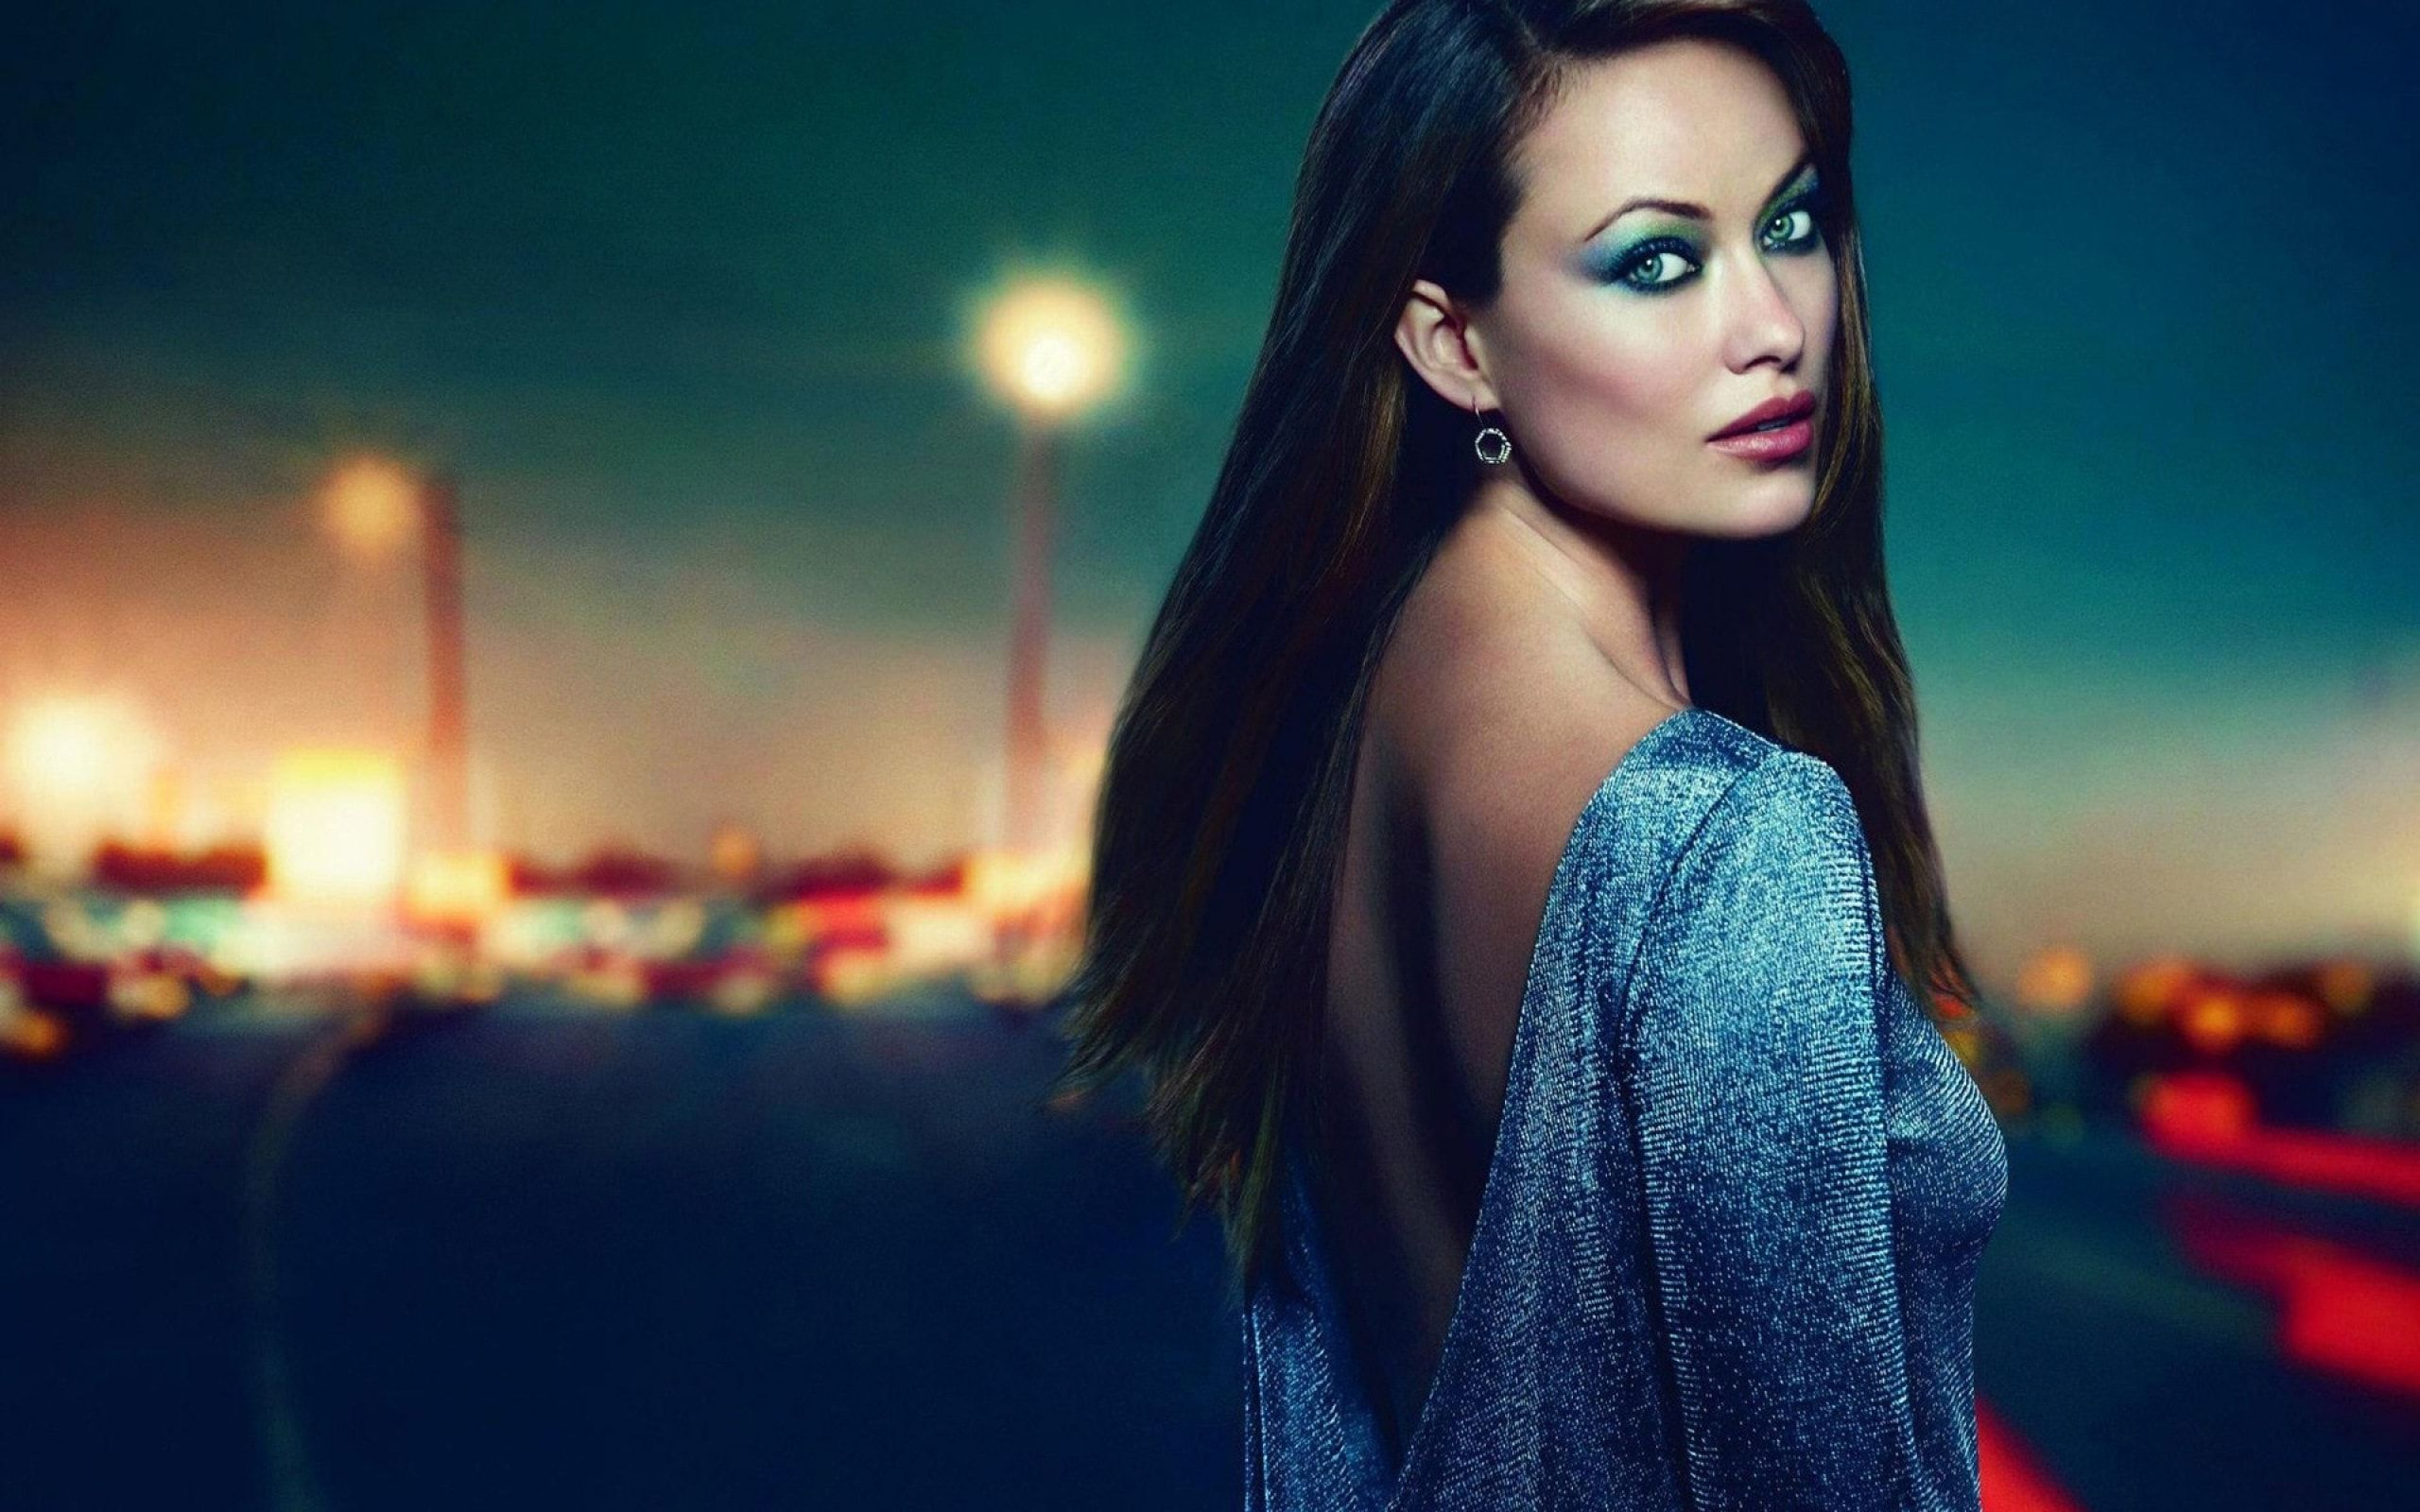 Olivia Wilde Wallpapers Top Free Olivia Wilde Backgrounds